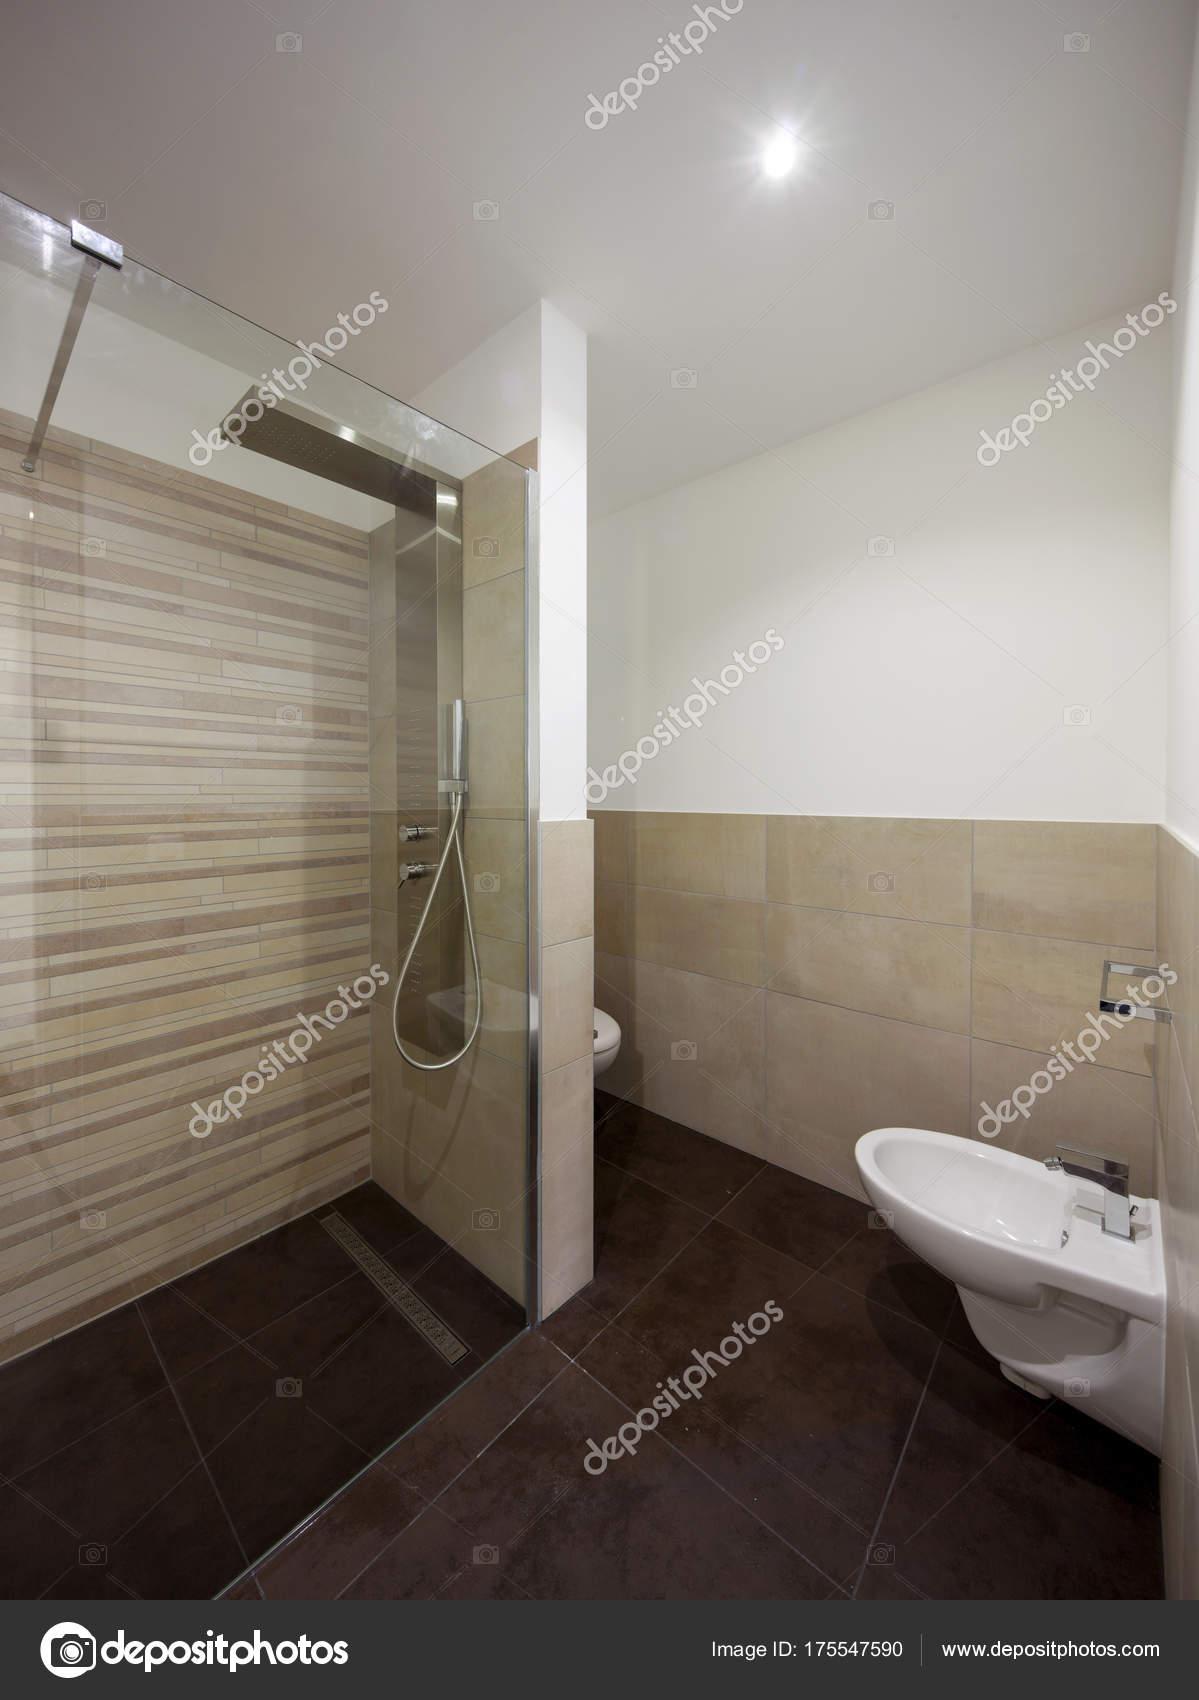 Bagni Moderni Marroni.Bagno Moderno Marrone Foto Stock C Zveiger 175547590